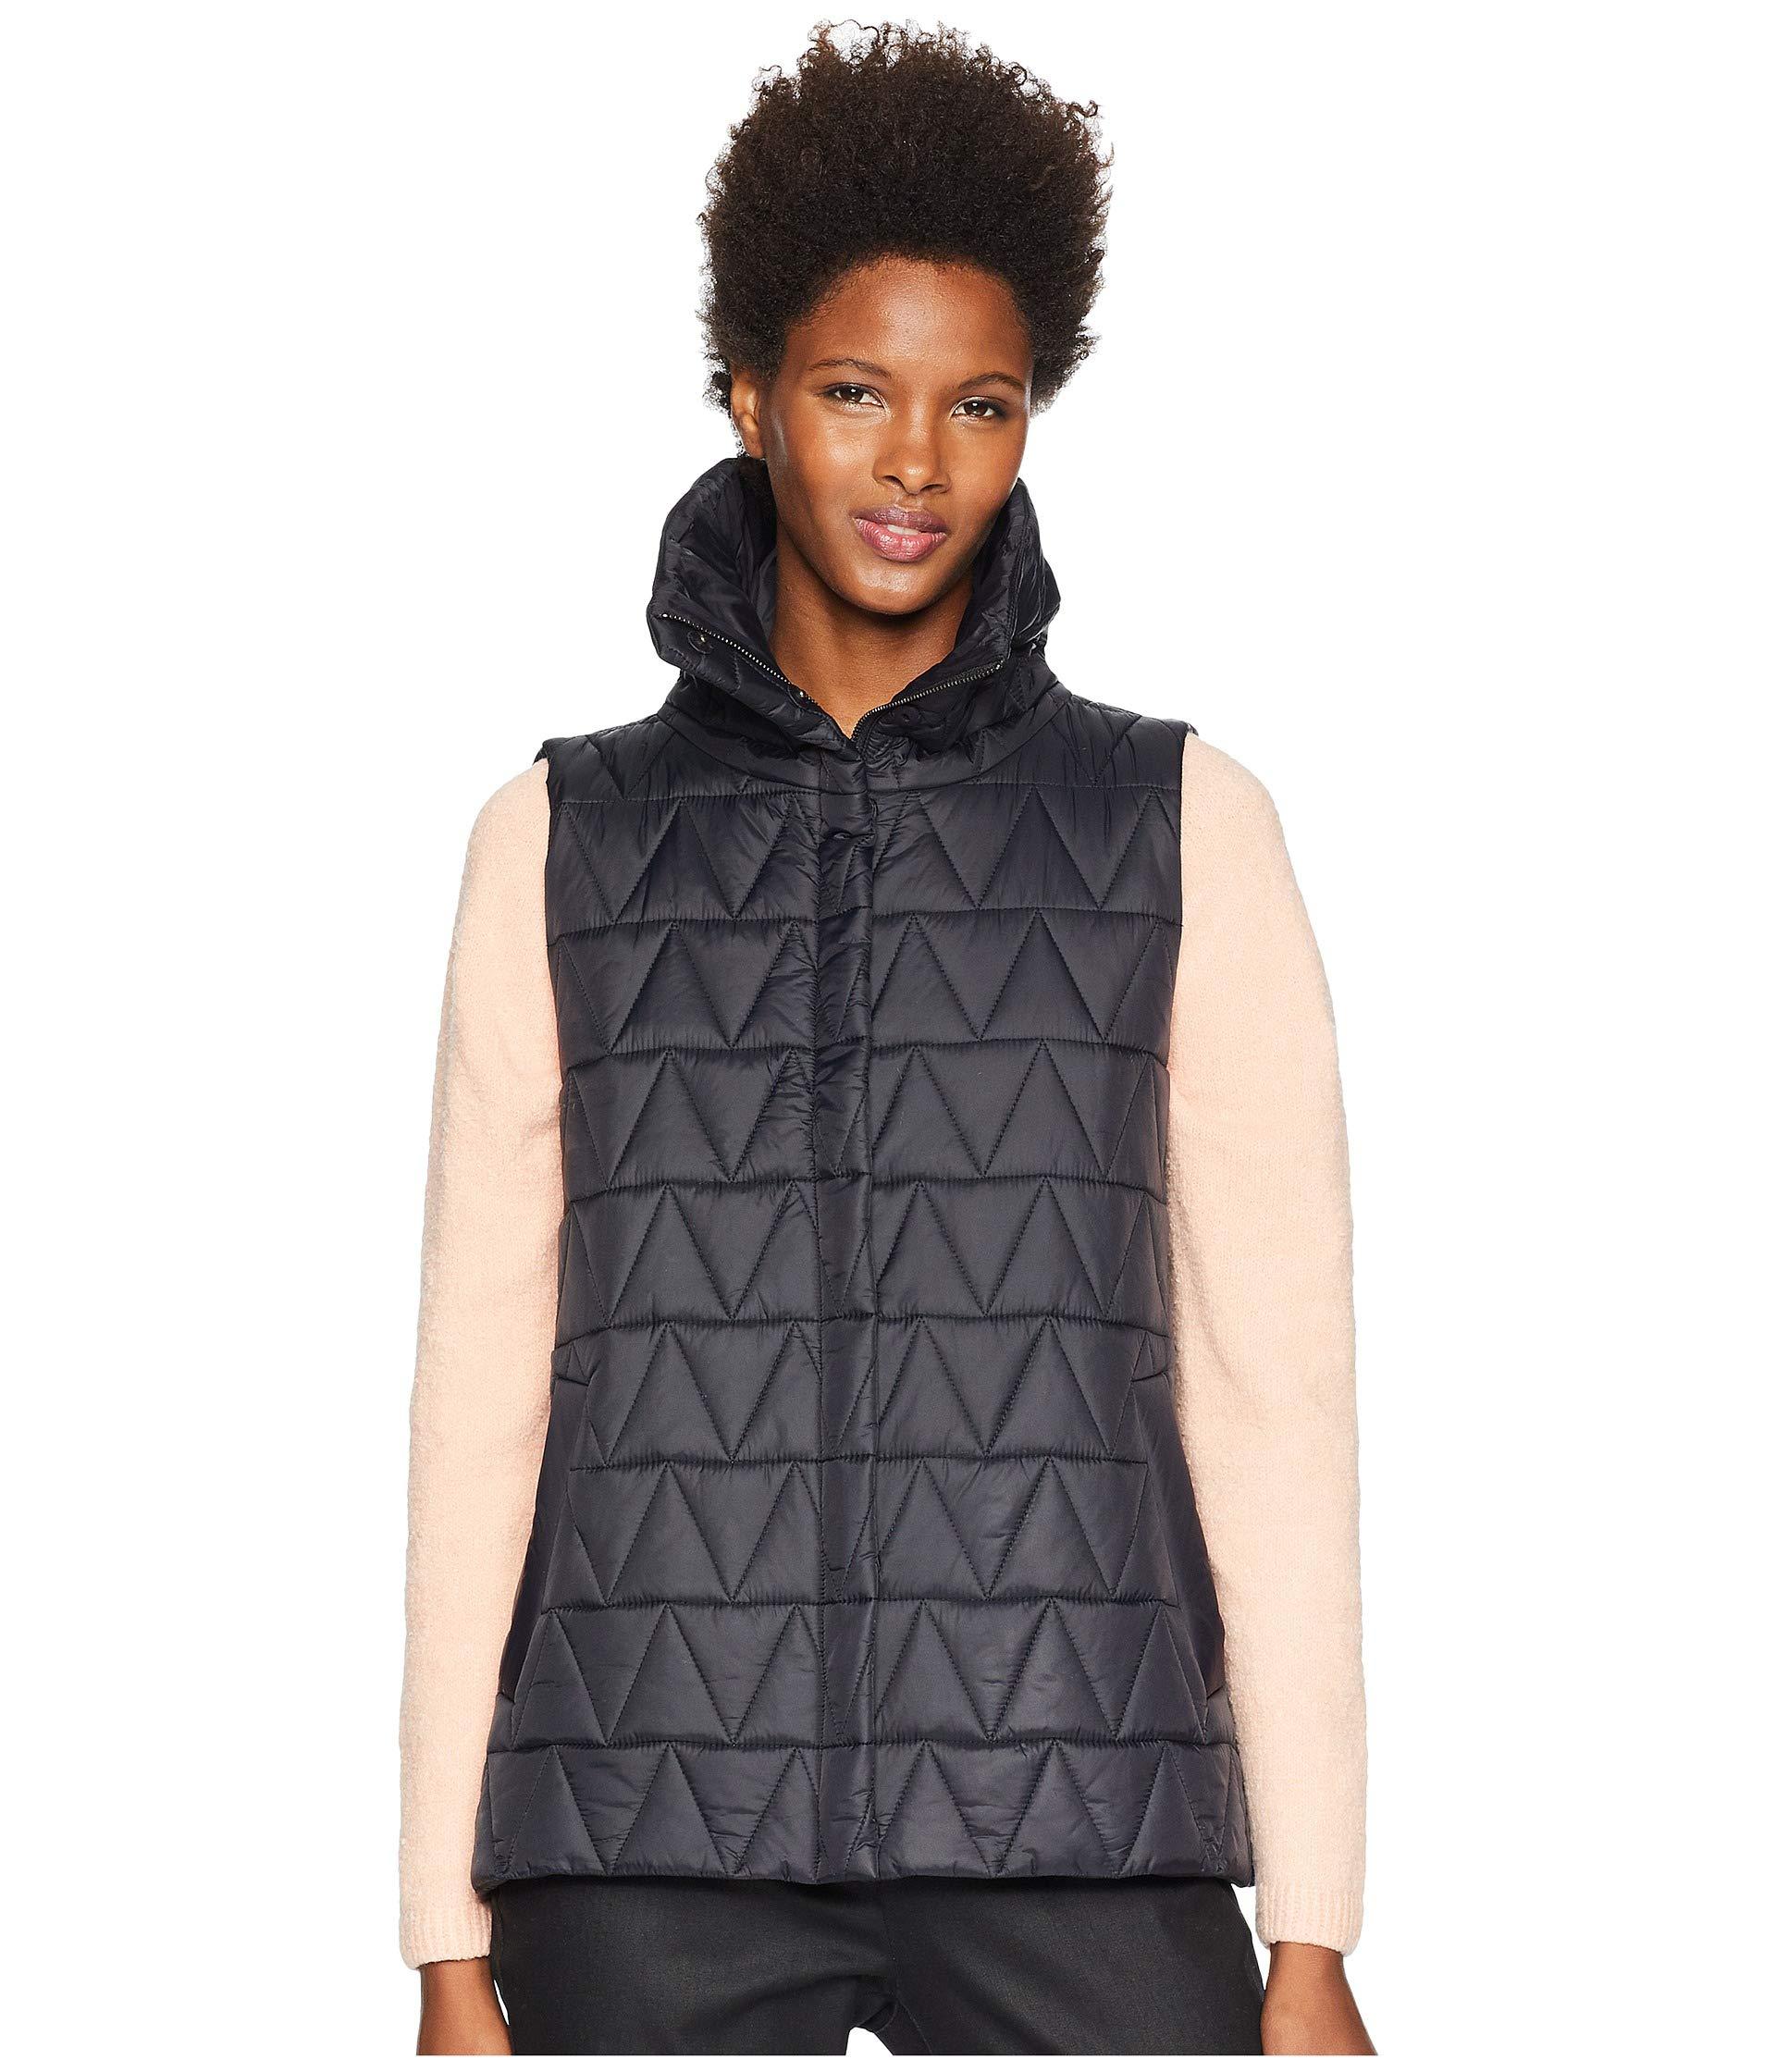 a650e8e9f47f High Black Chevron Eileen Fisher Stand Collar Vest Nylon Recycled x8wIwqH